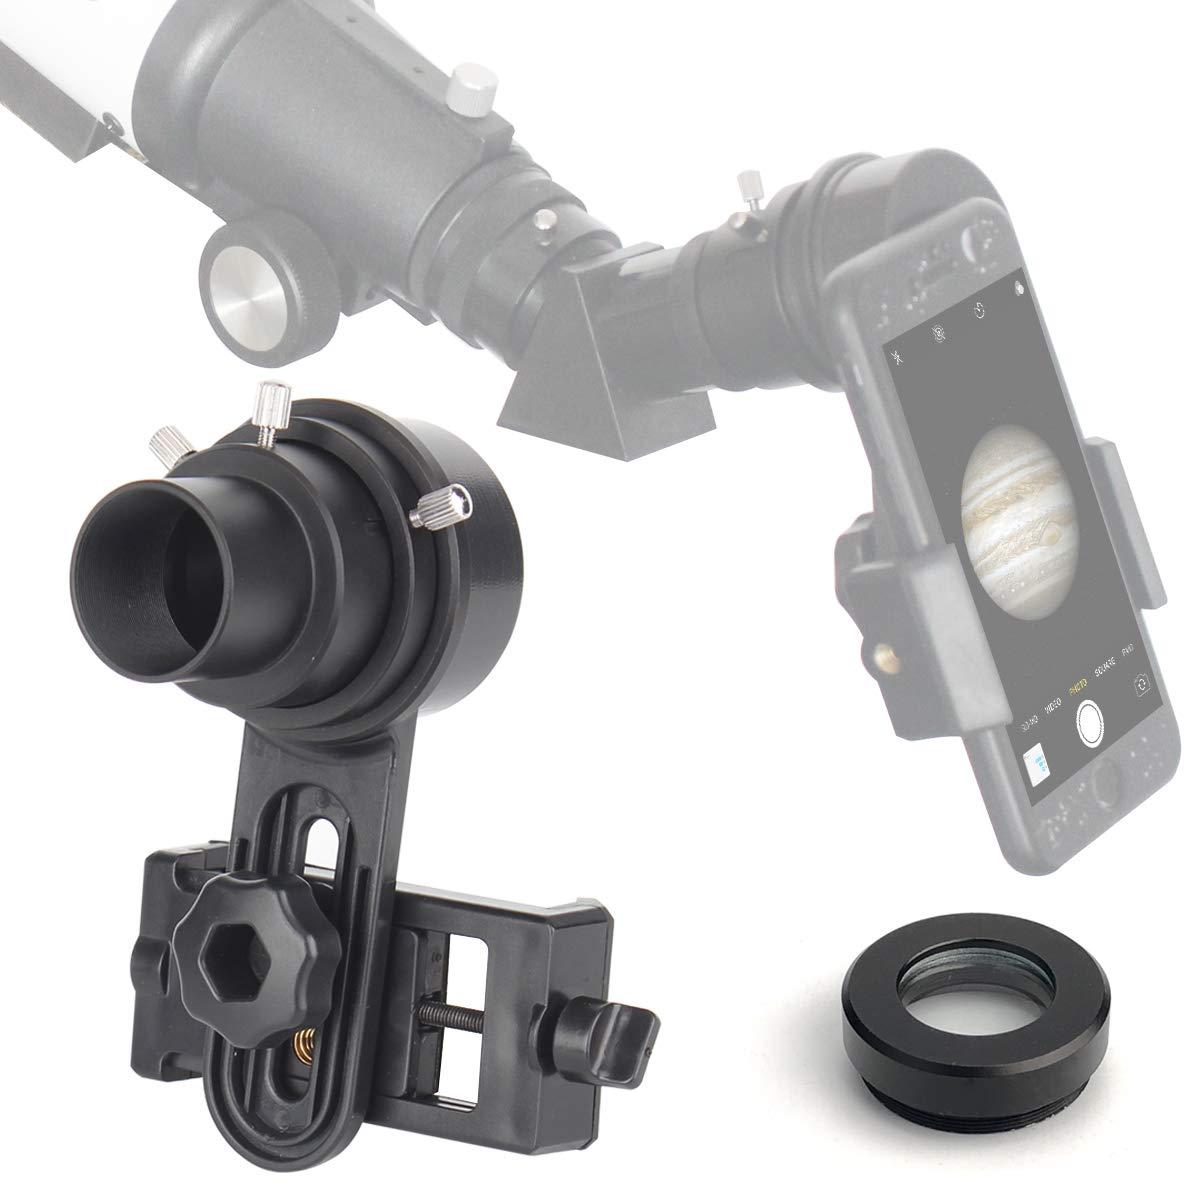 SOLOMARK Adaptador de telescopio para smartphone de 1,25 pulgadas ...